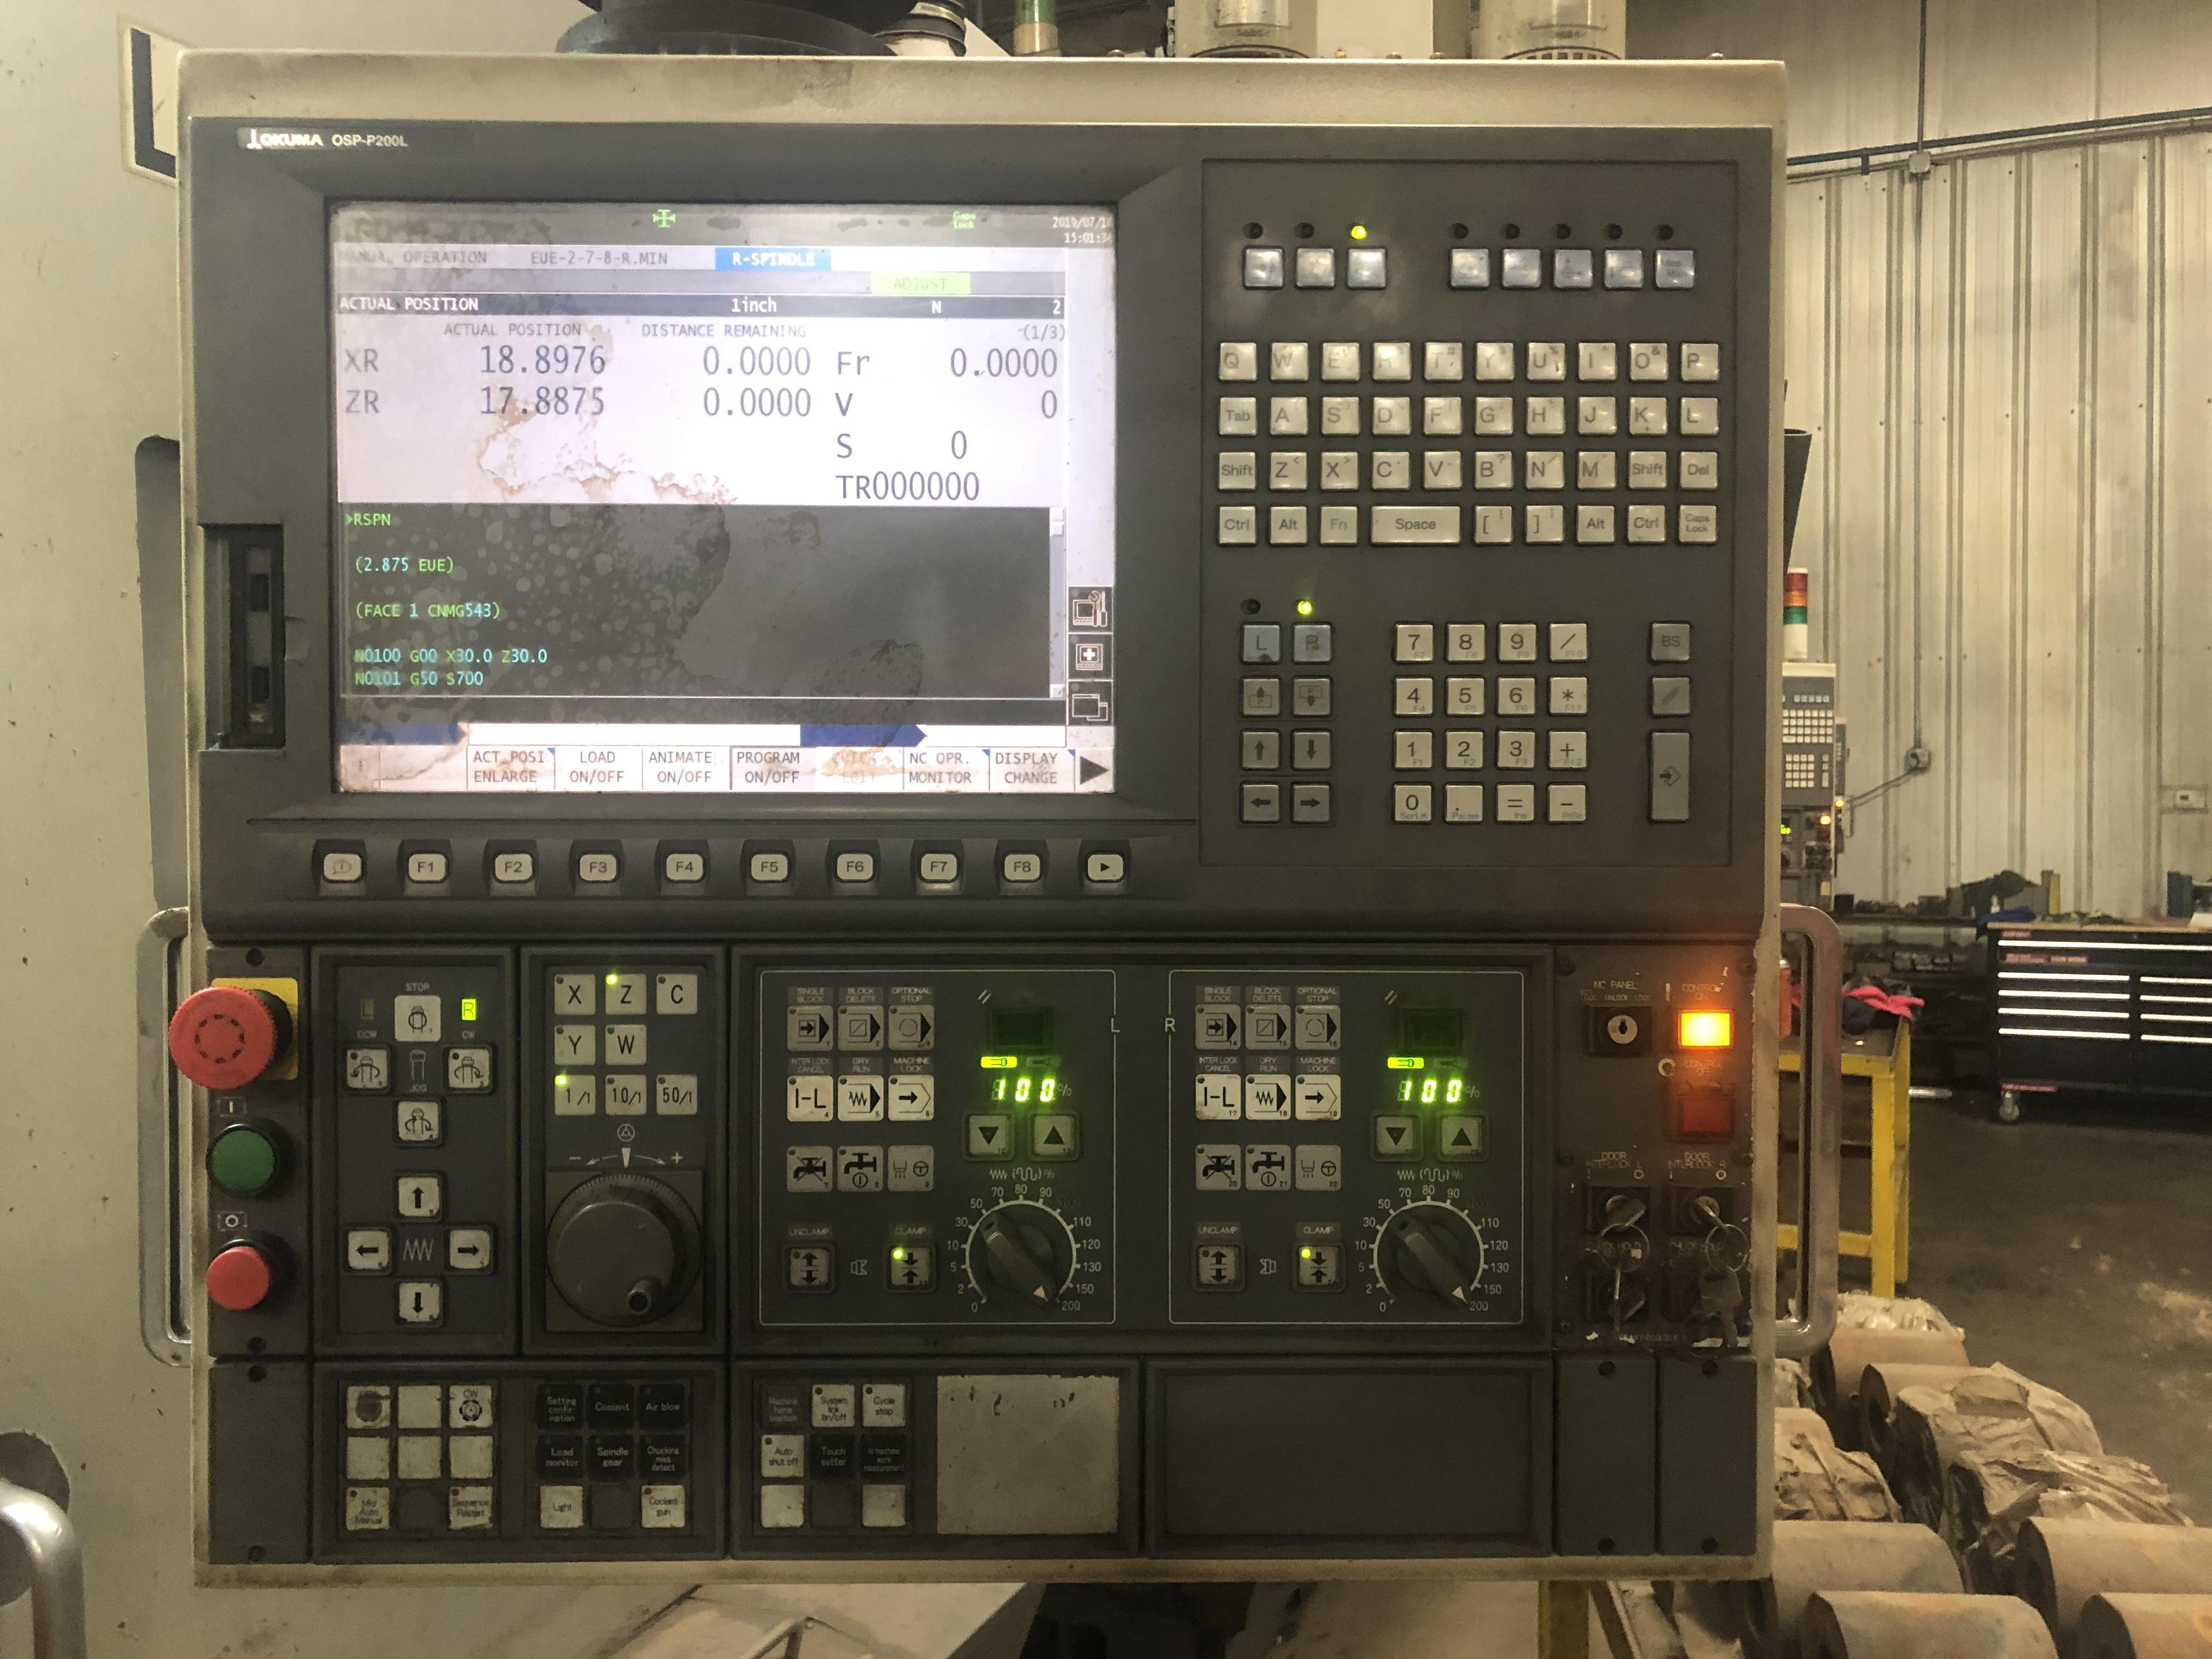 OKUMA 2SP-V40 - Lathes, VTL (Vertical Turret Lathe